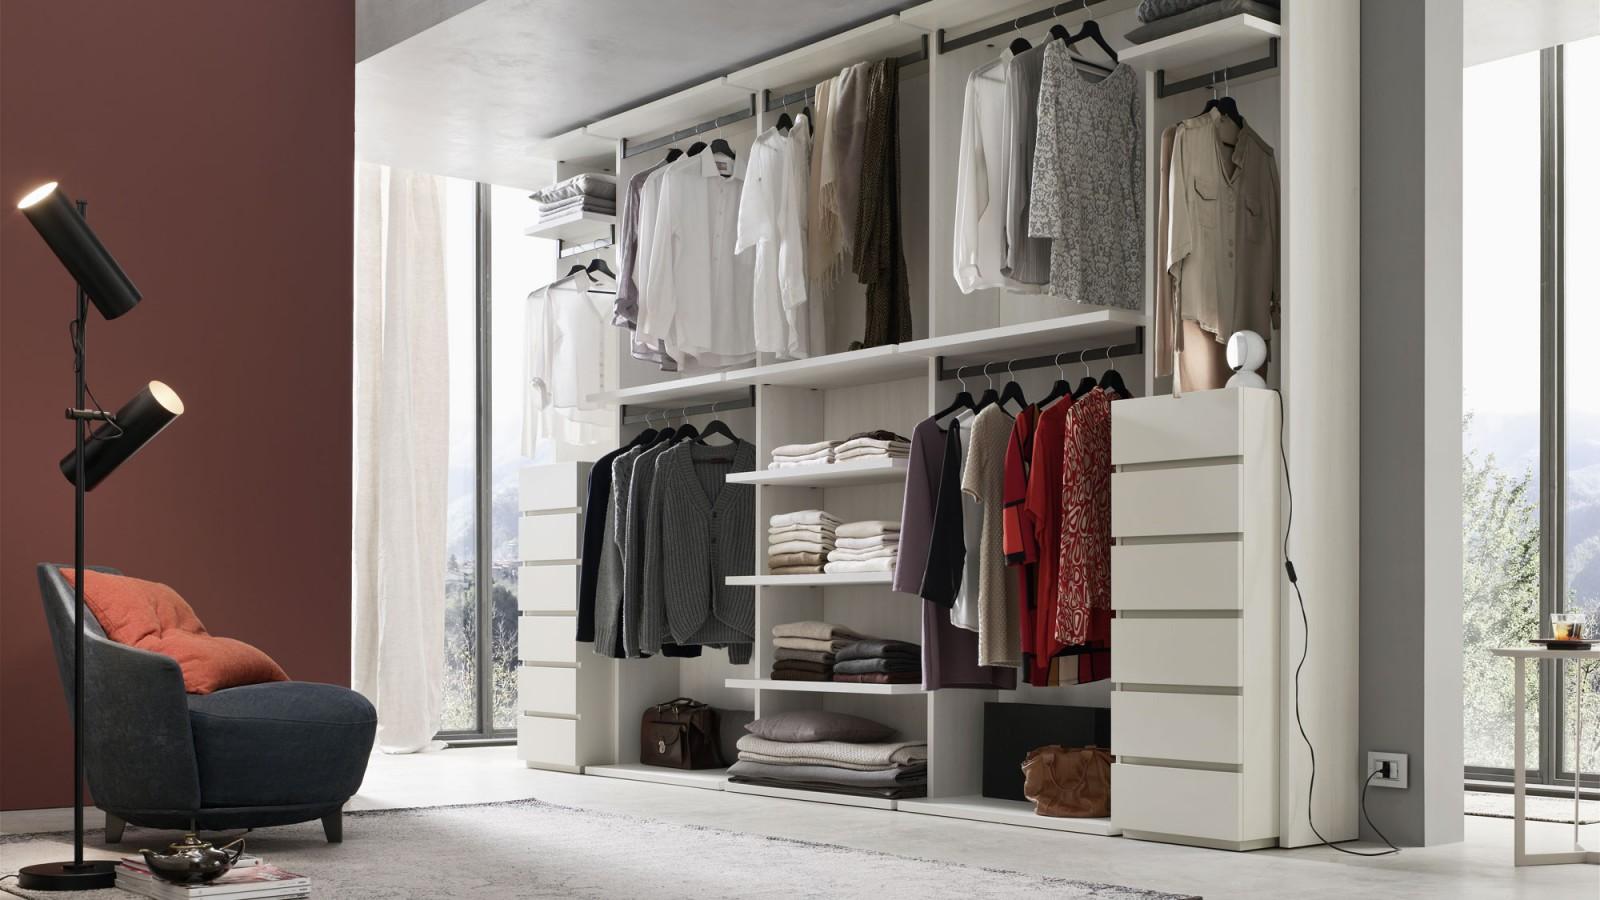 Cabina armadio flexi orme centro mobili godiasco - Mobili per cabina armadio ...